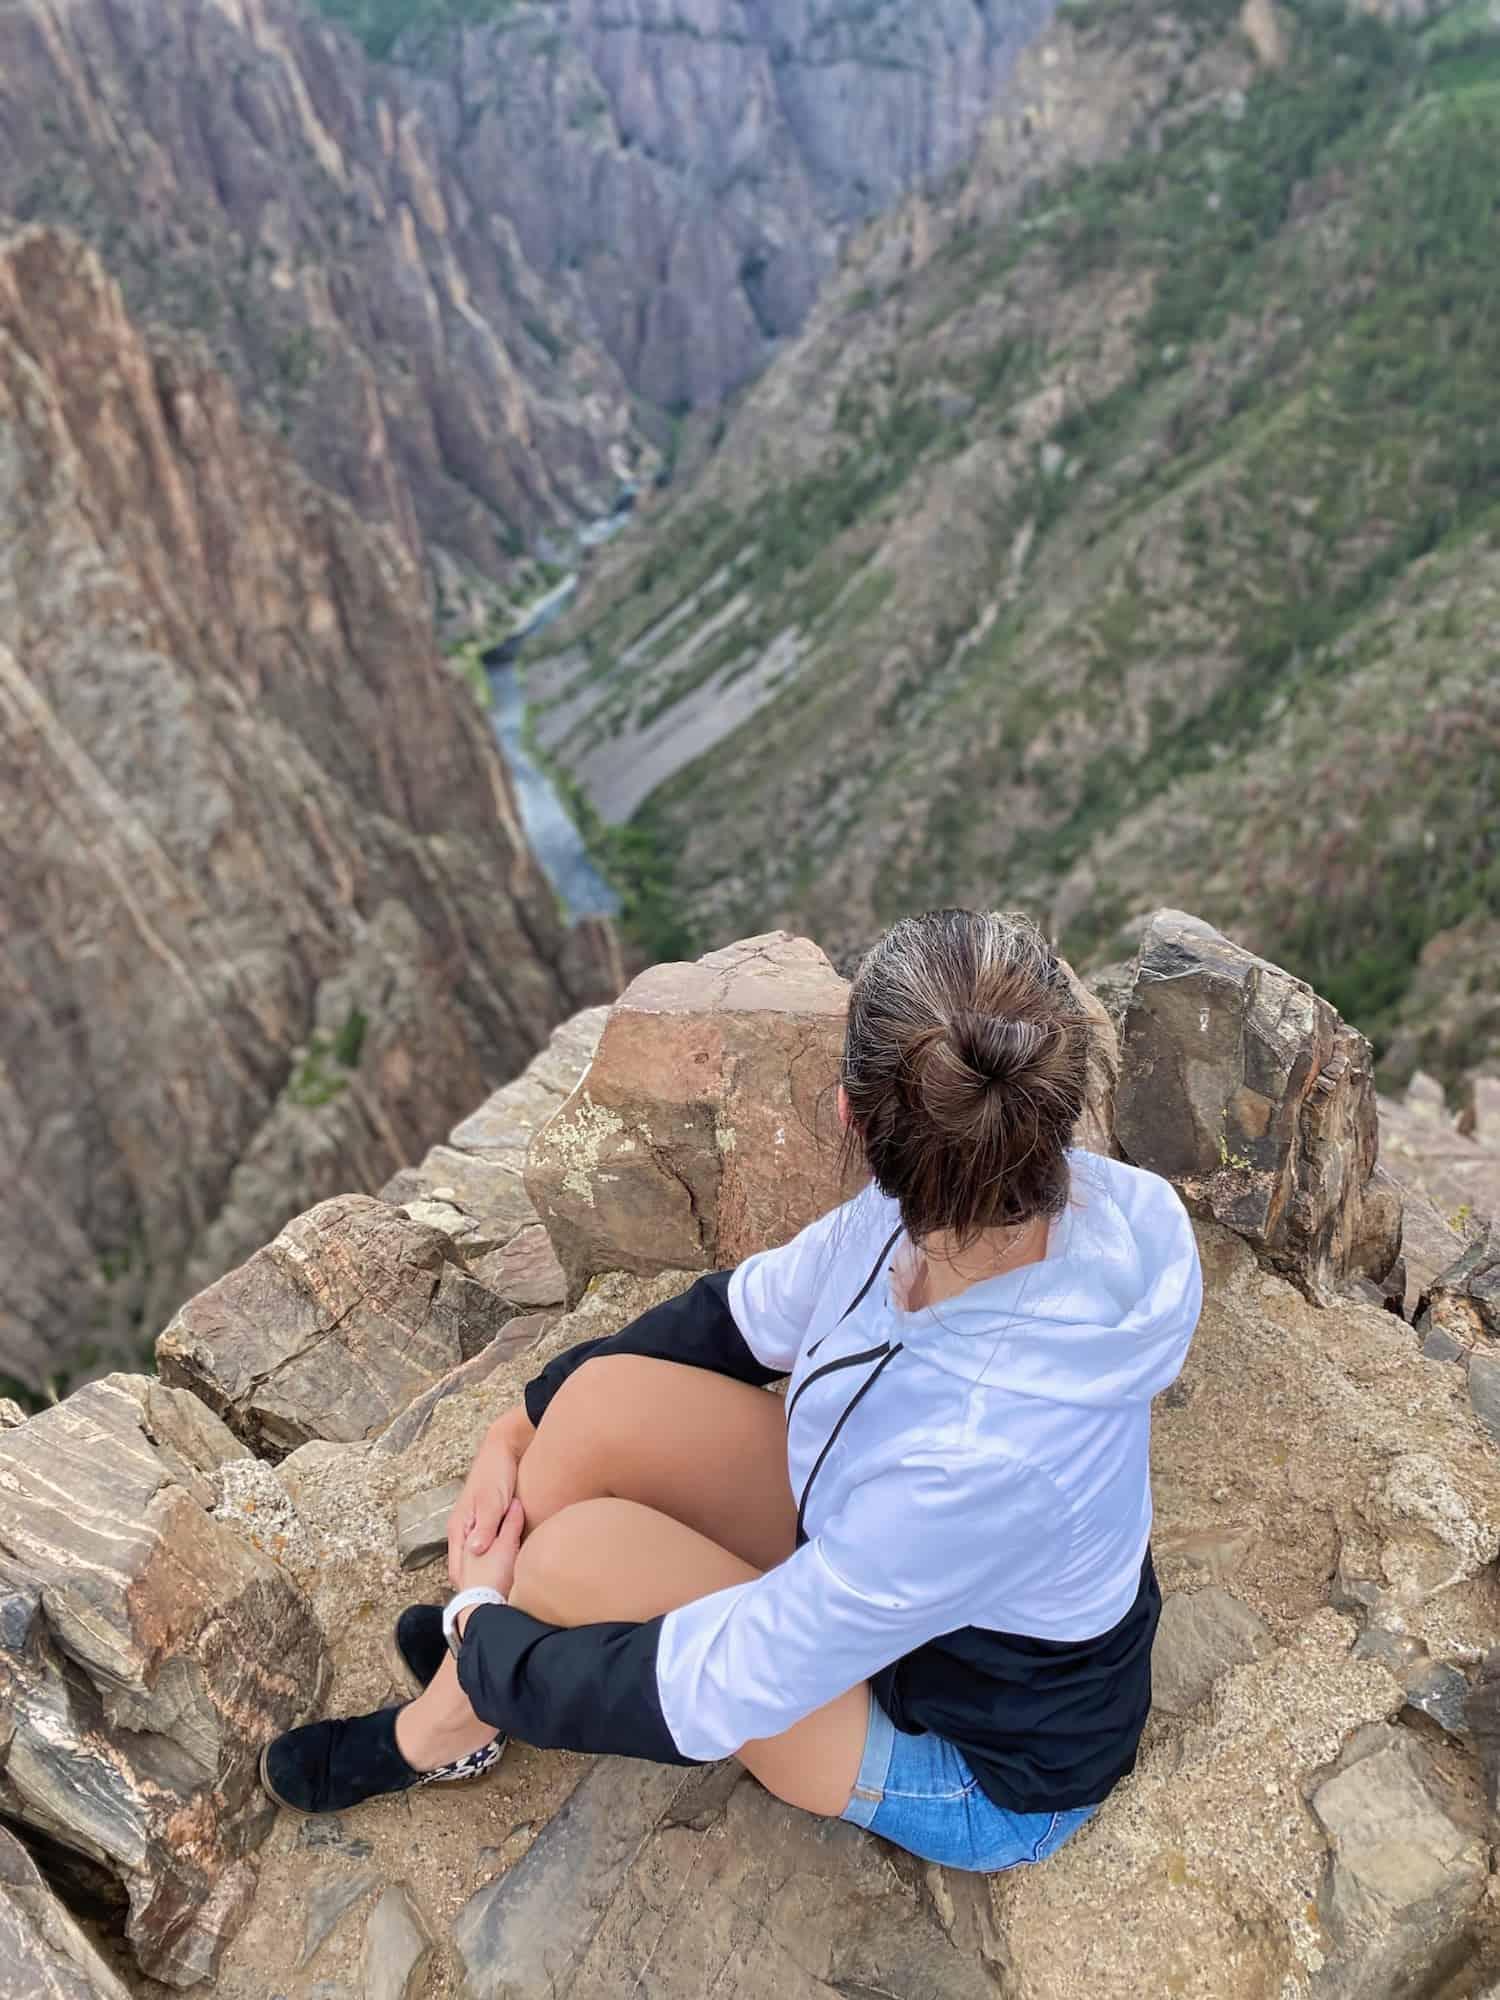 Colarado National Park - Black Canyon of the Gunnison